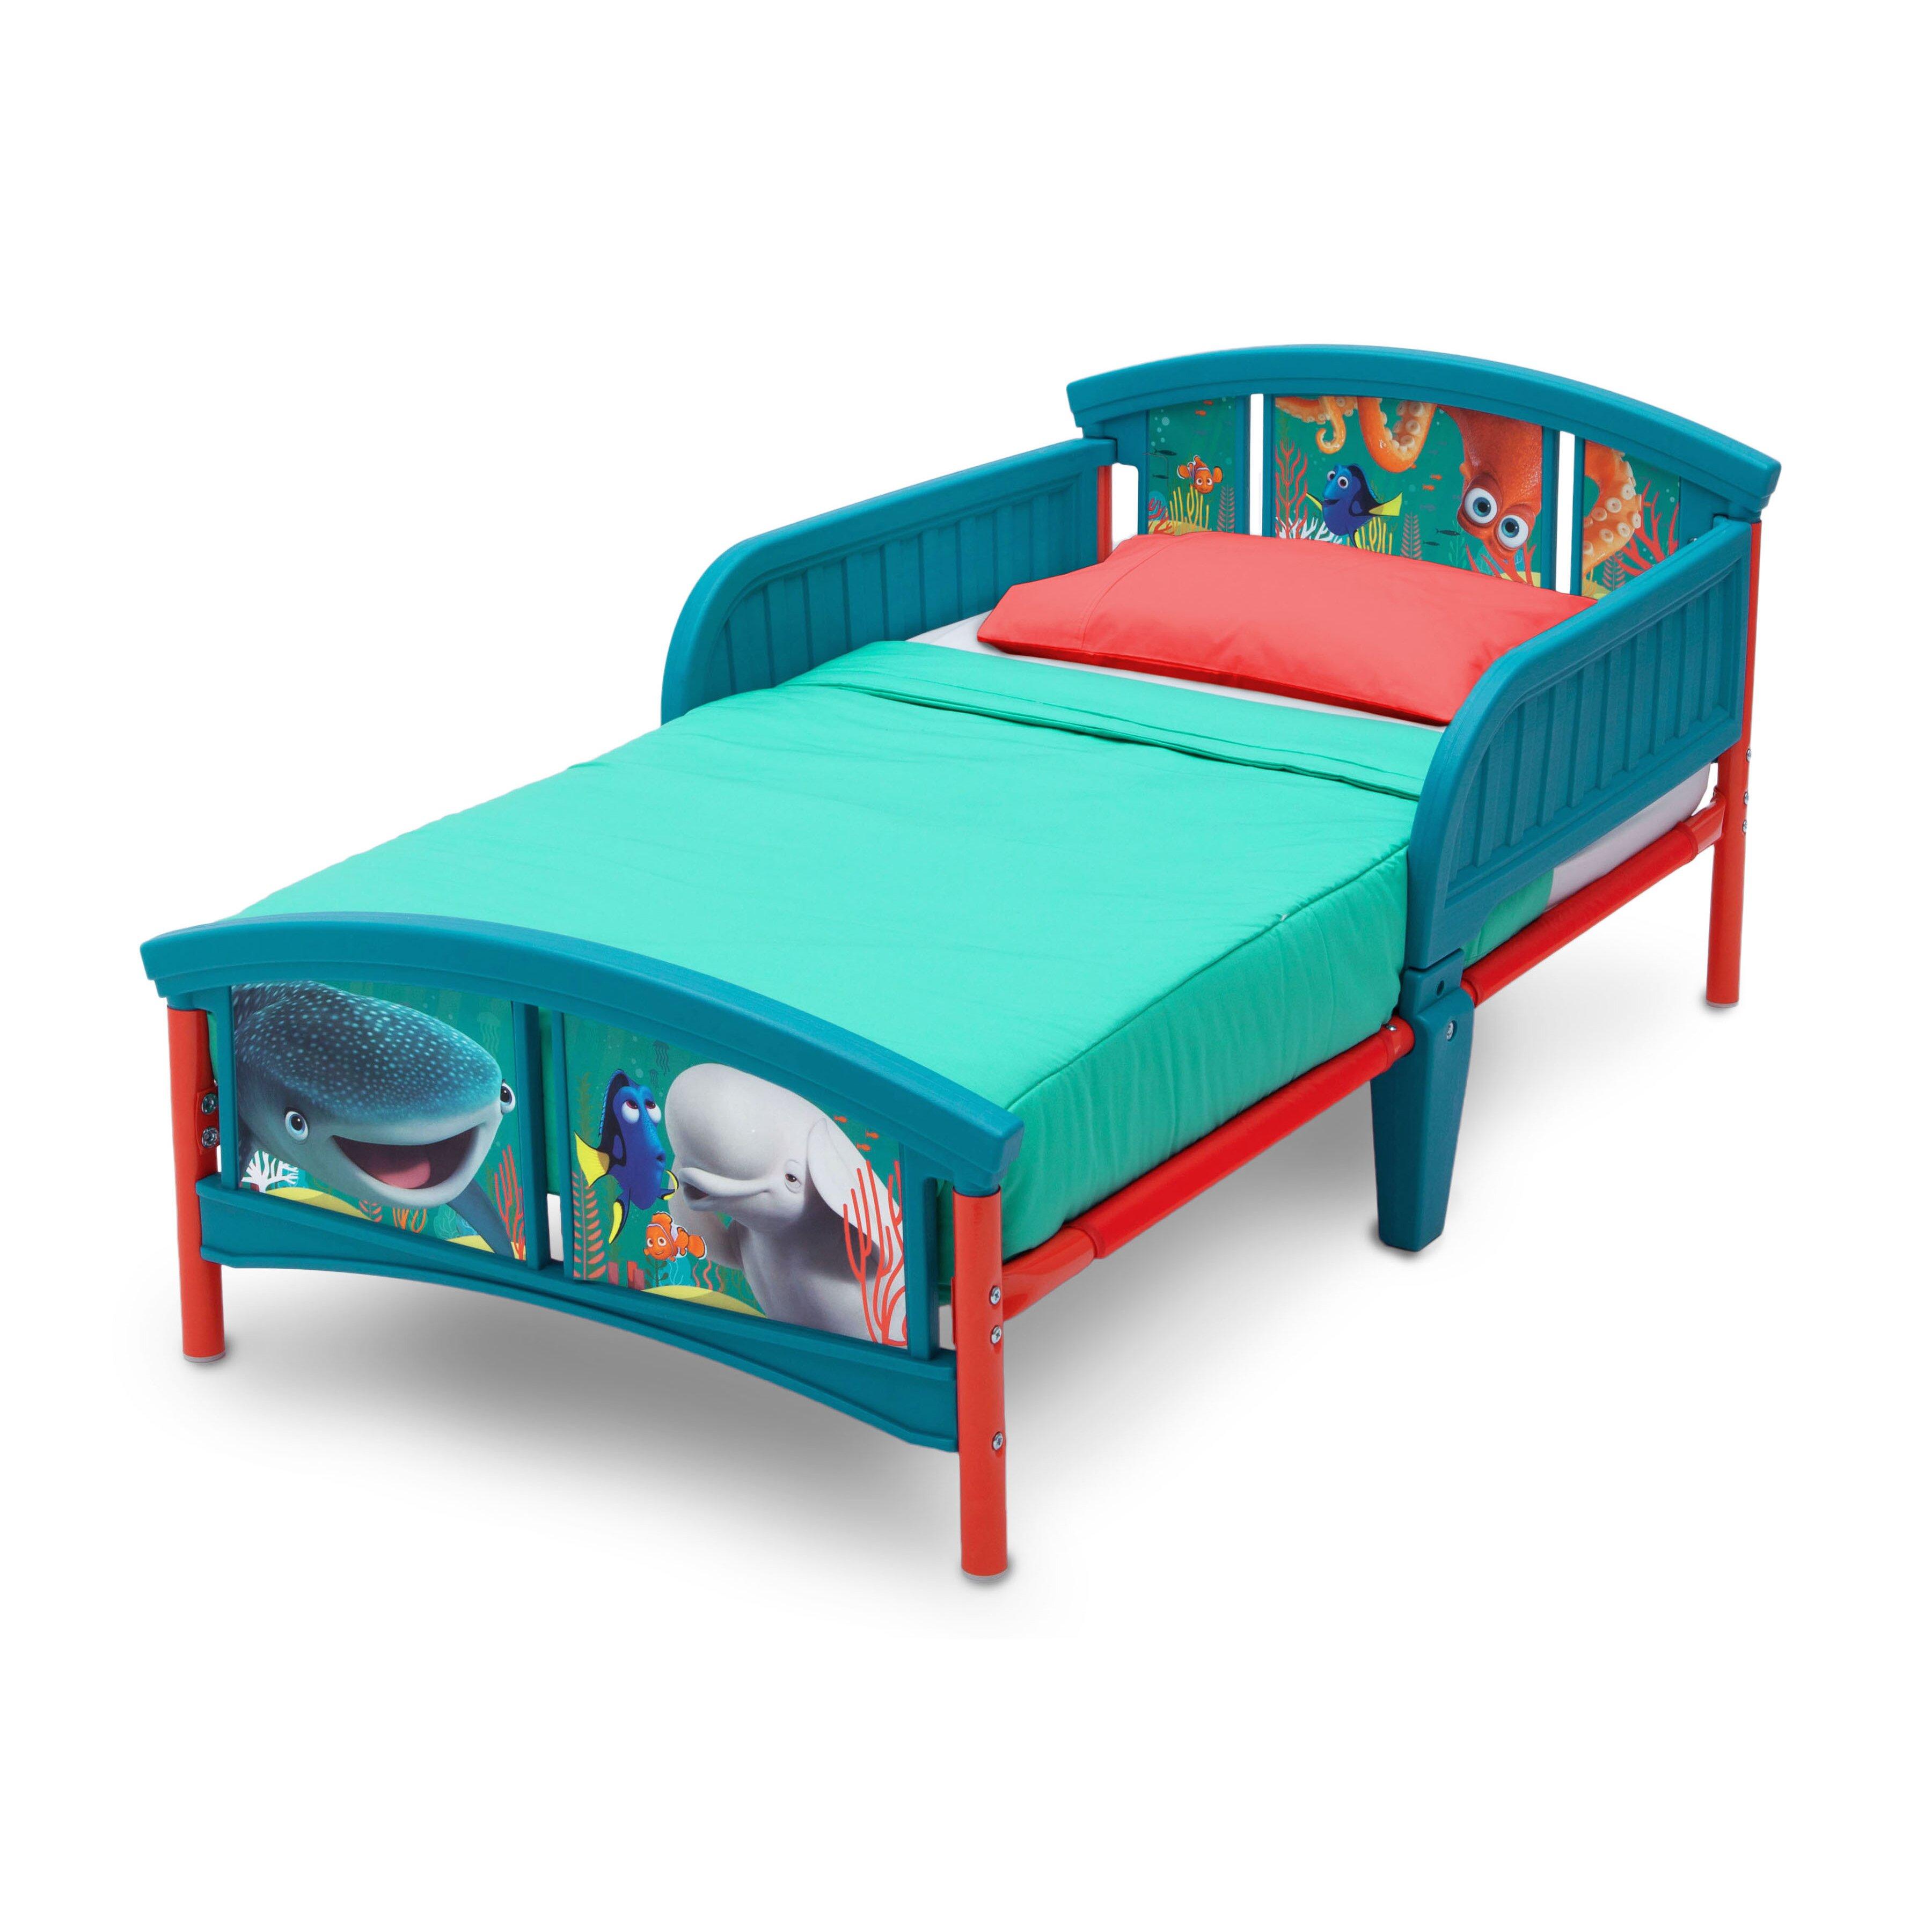 Delta Toddler Bed 28 Images Target Expect More Pay Less Delta Children Disney Pixar Cars Ii